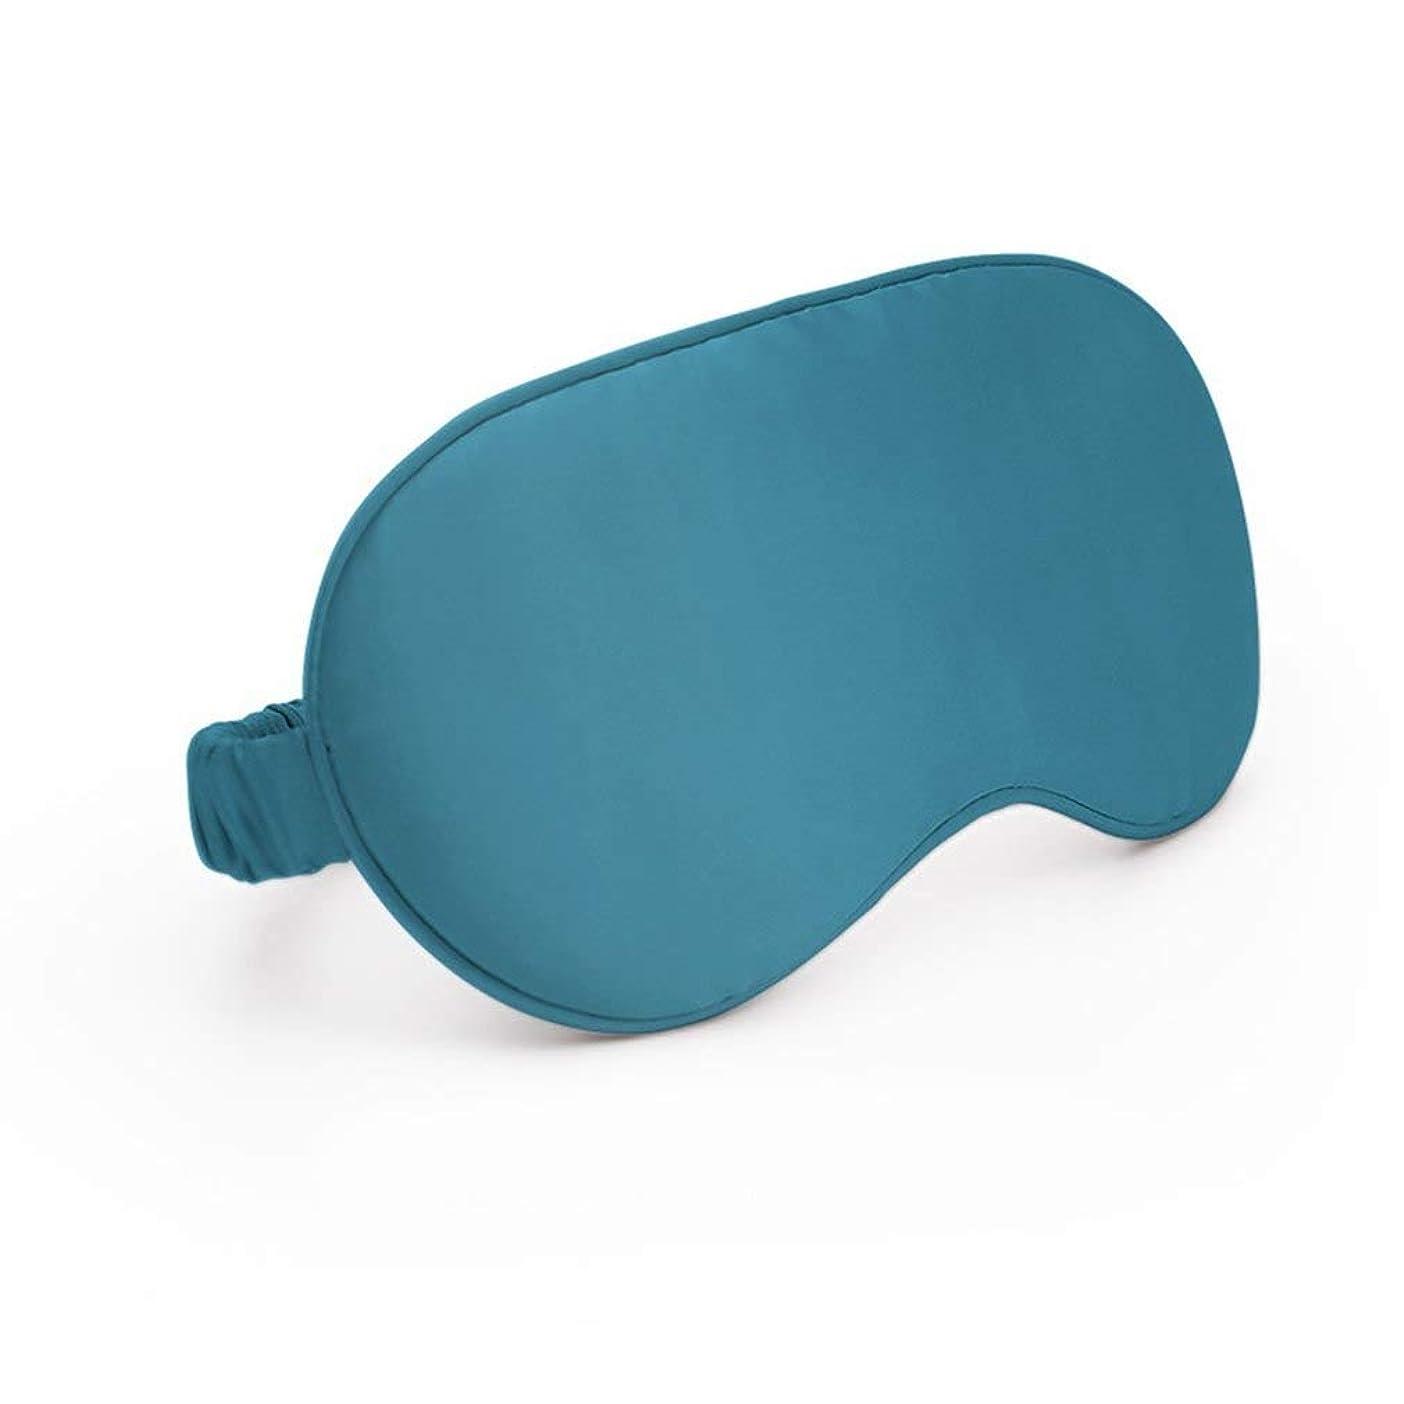 NOTE アイシェードスリーピングアイマスクカバーアイパッチプリーツst02サテンシルク両面遮光ゴーグル化粧品ファッション女性